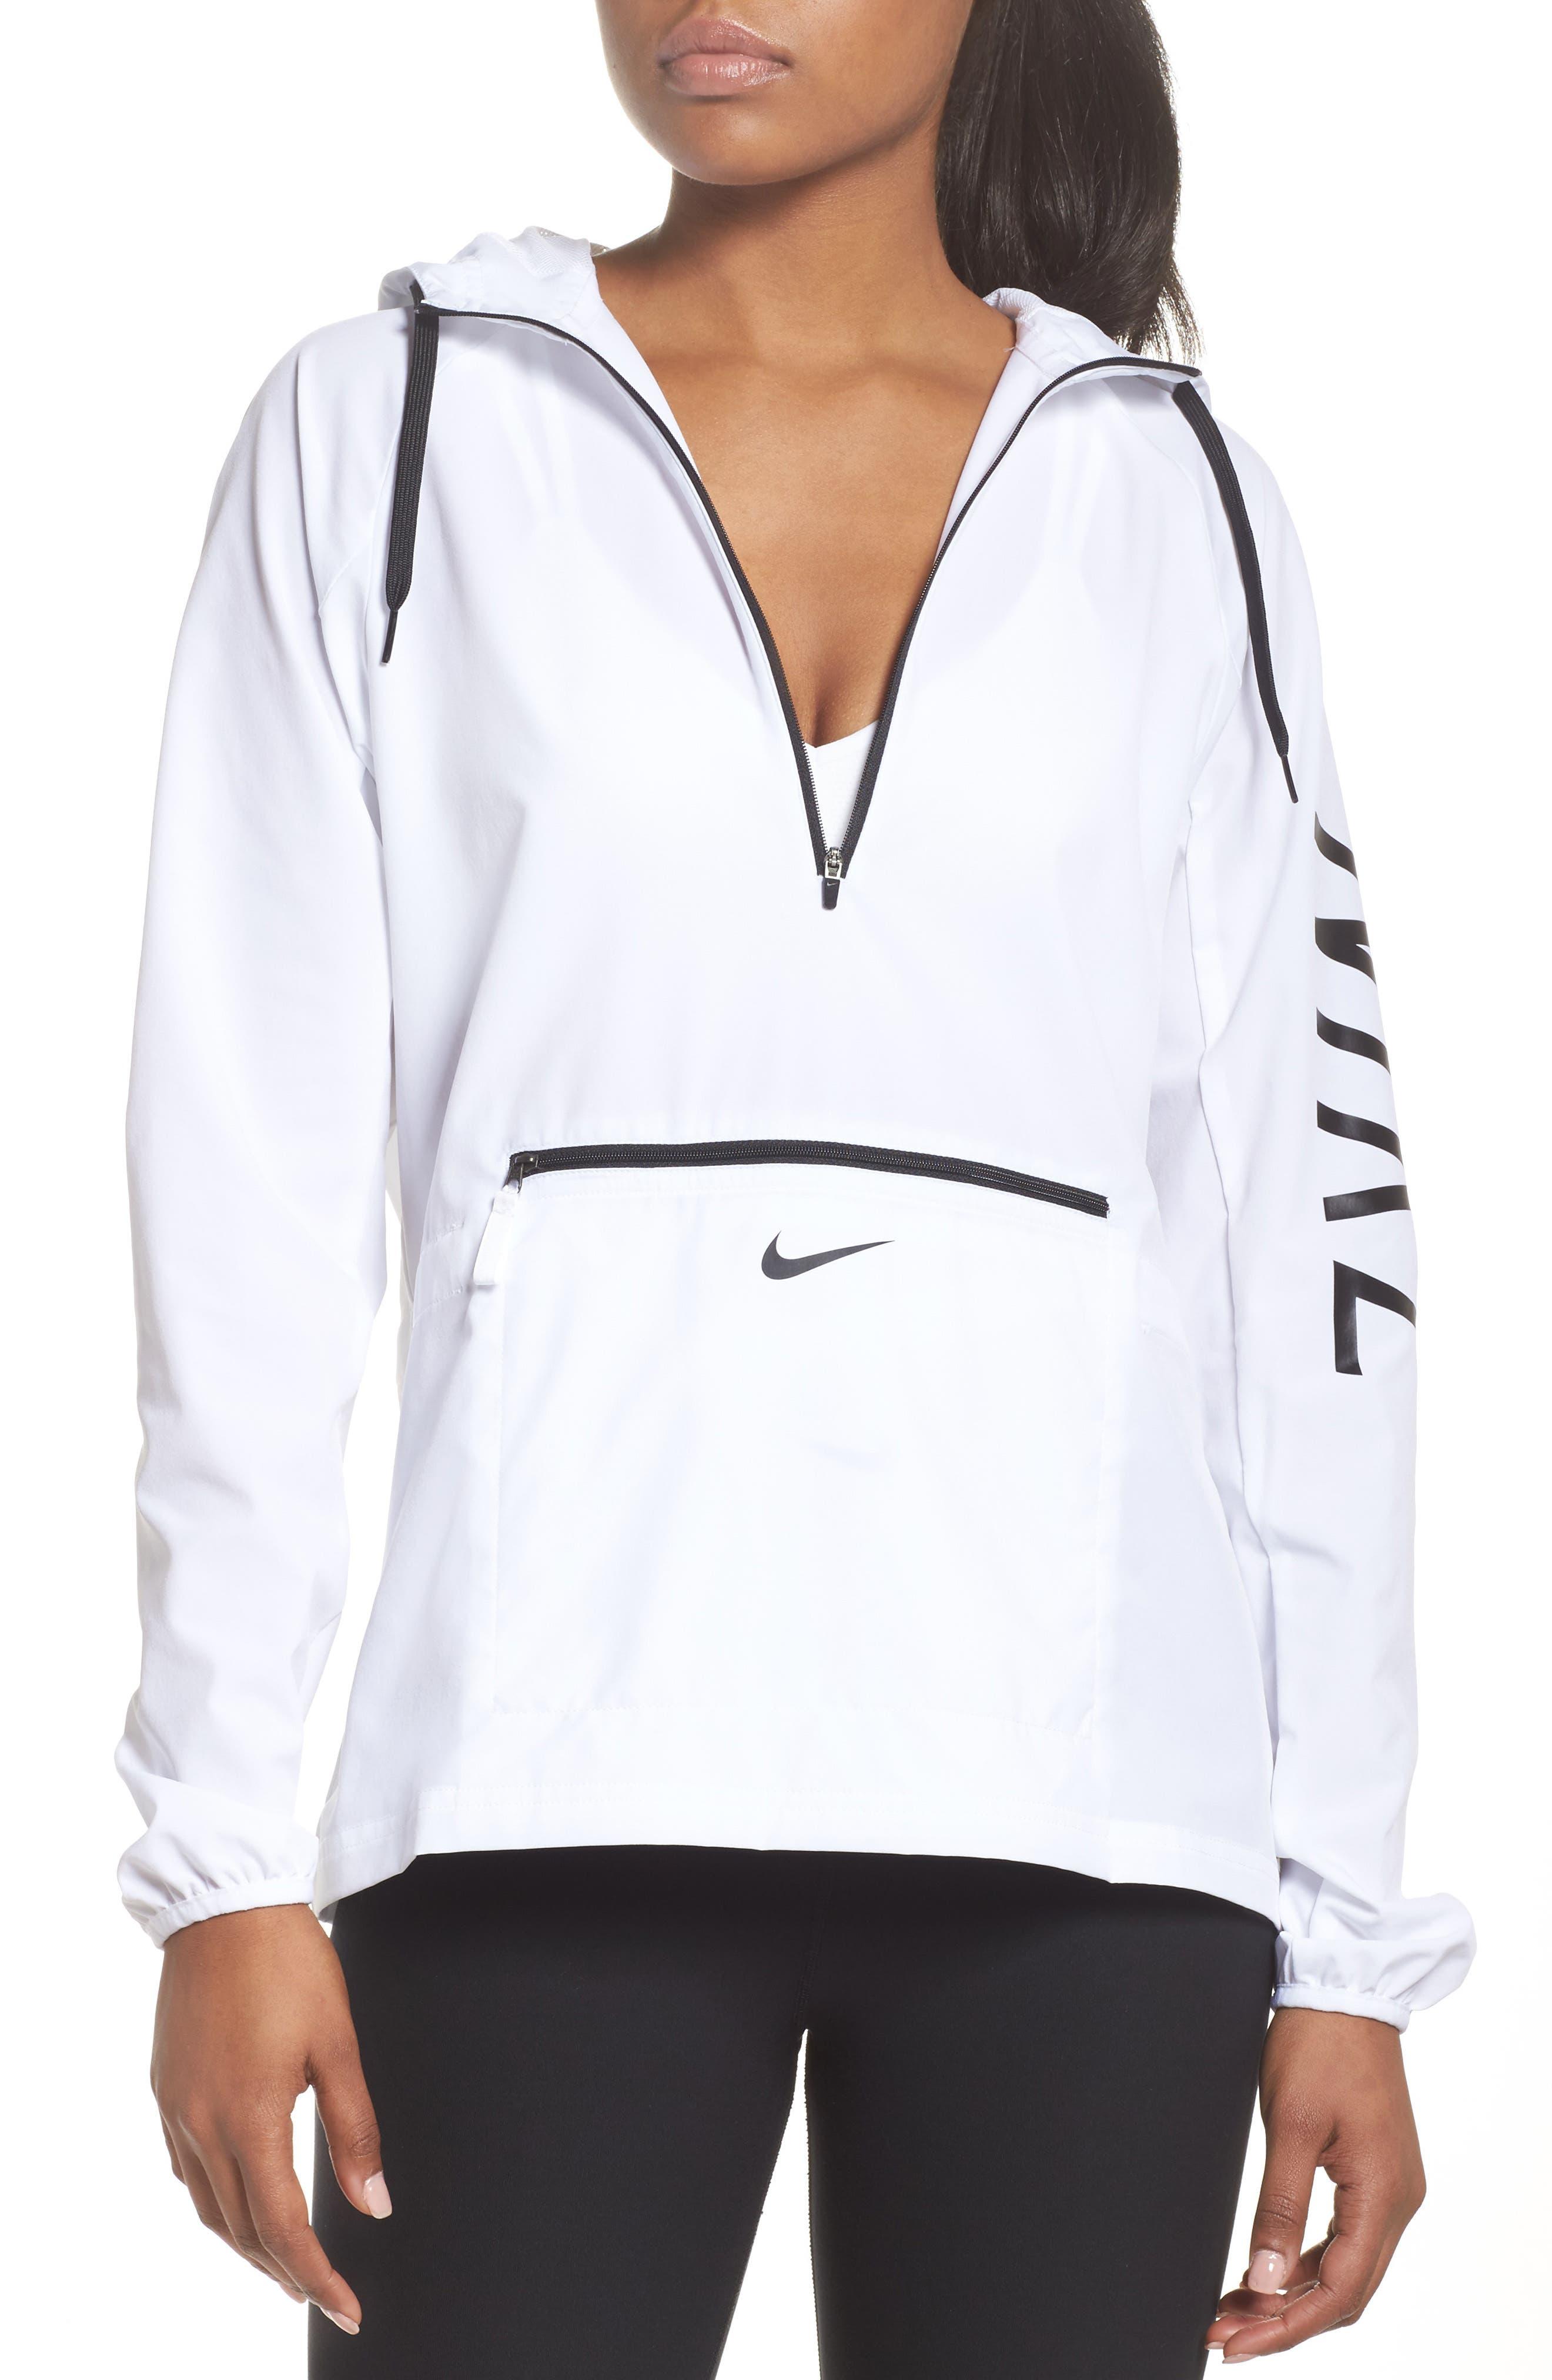 Flex Packable Hooded Training Jacket,                             Main thumbnail 1, color,                             100